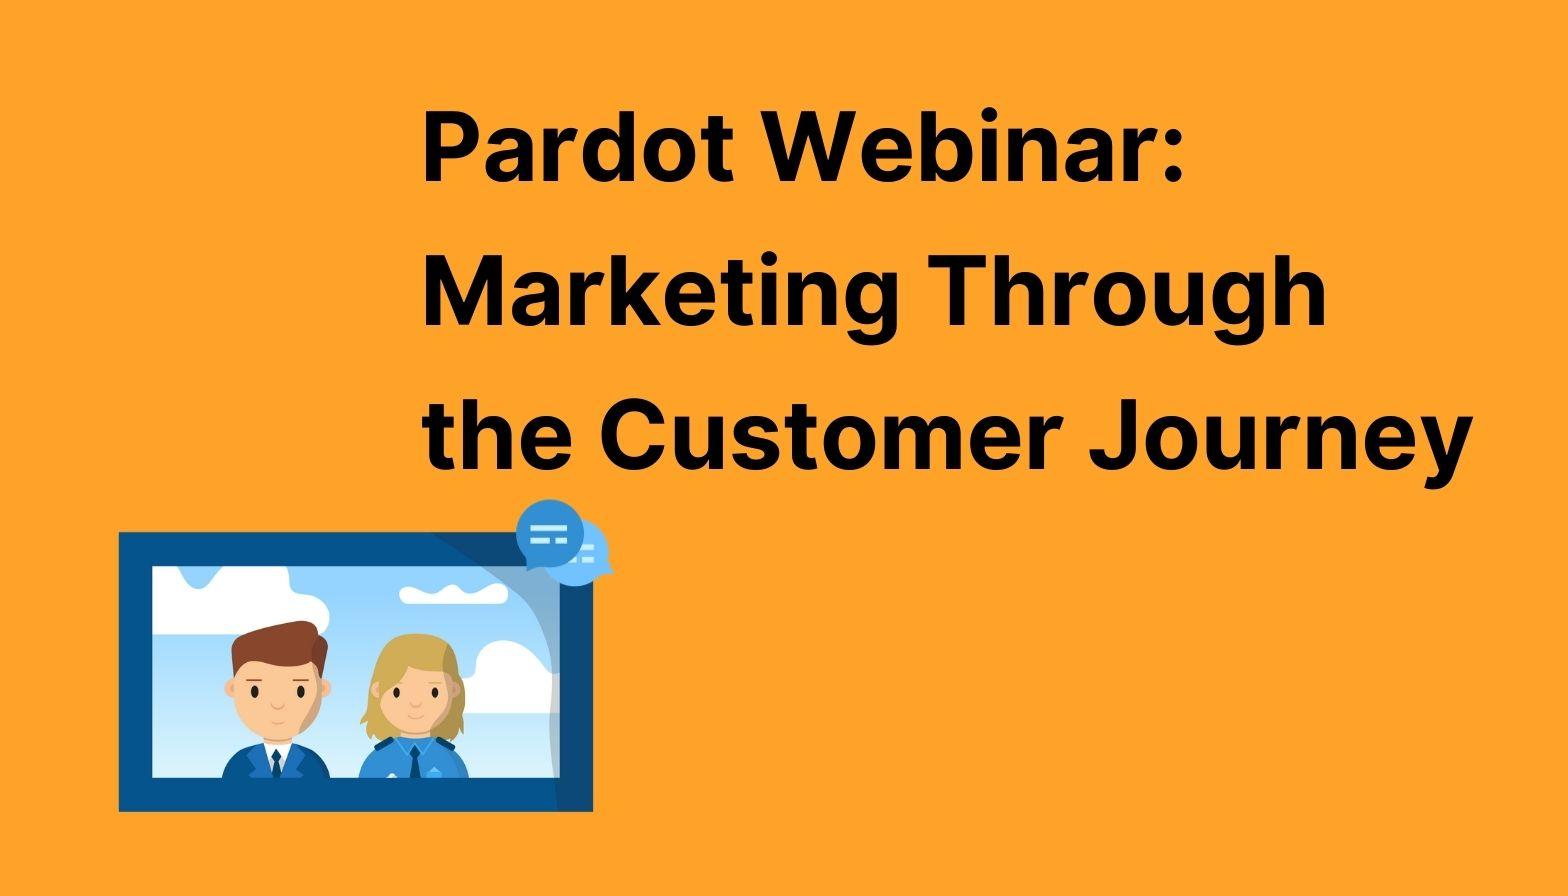 Pardot Webinar: Marketing Through the Customer Journey